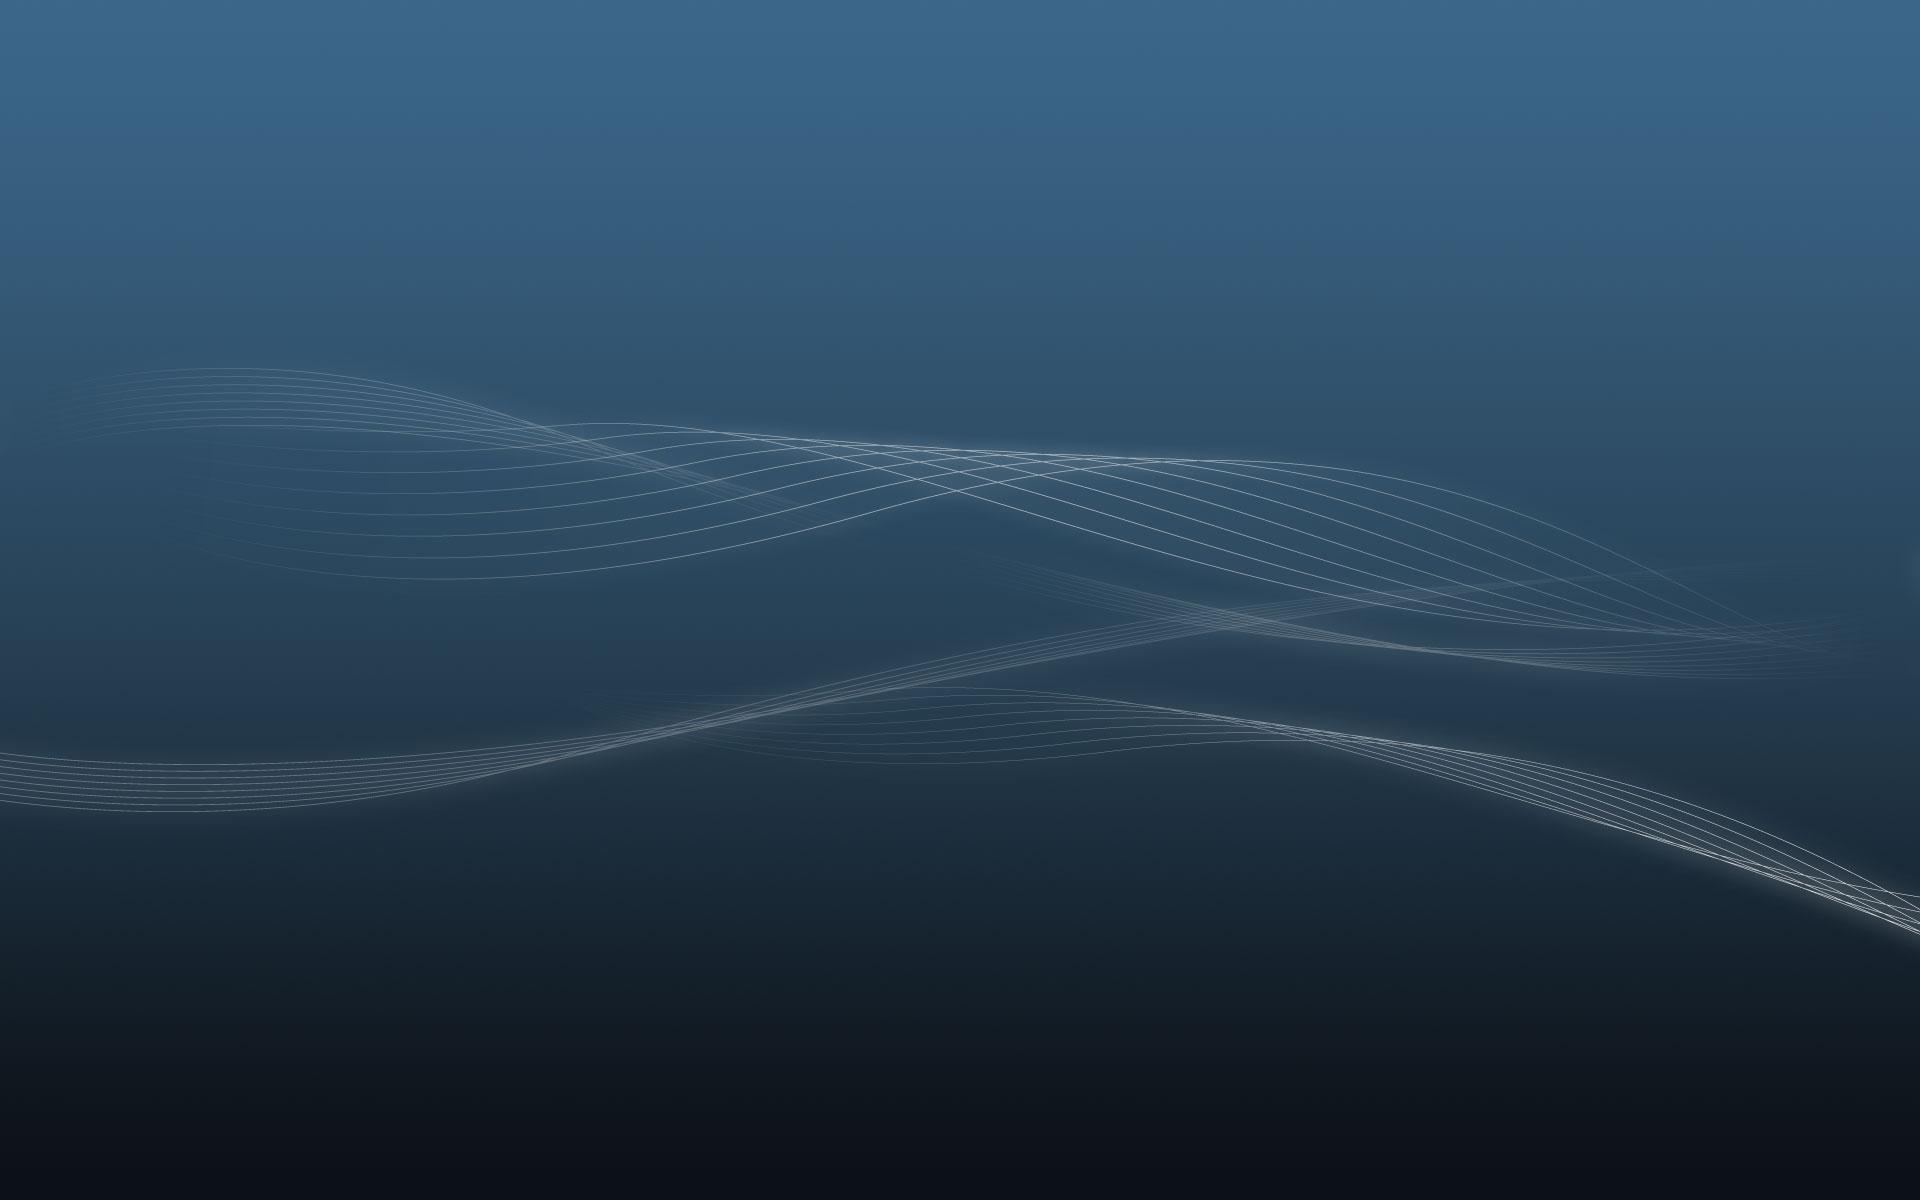 wallpaper player background desktop windows backgroundimage 1920x1200